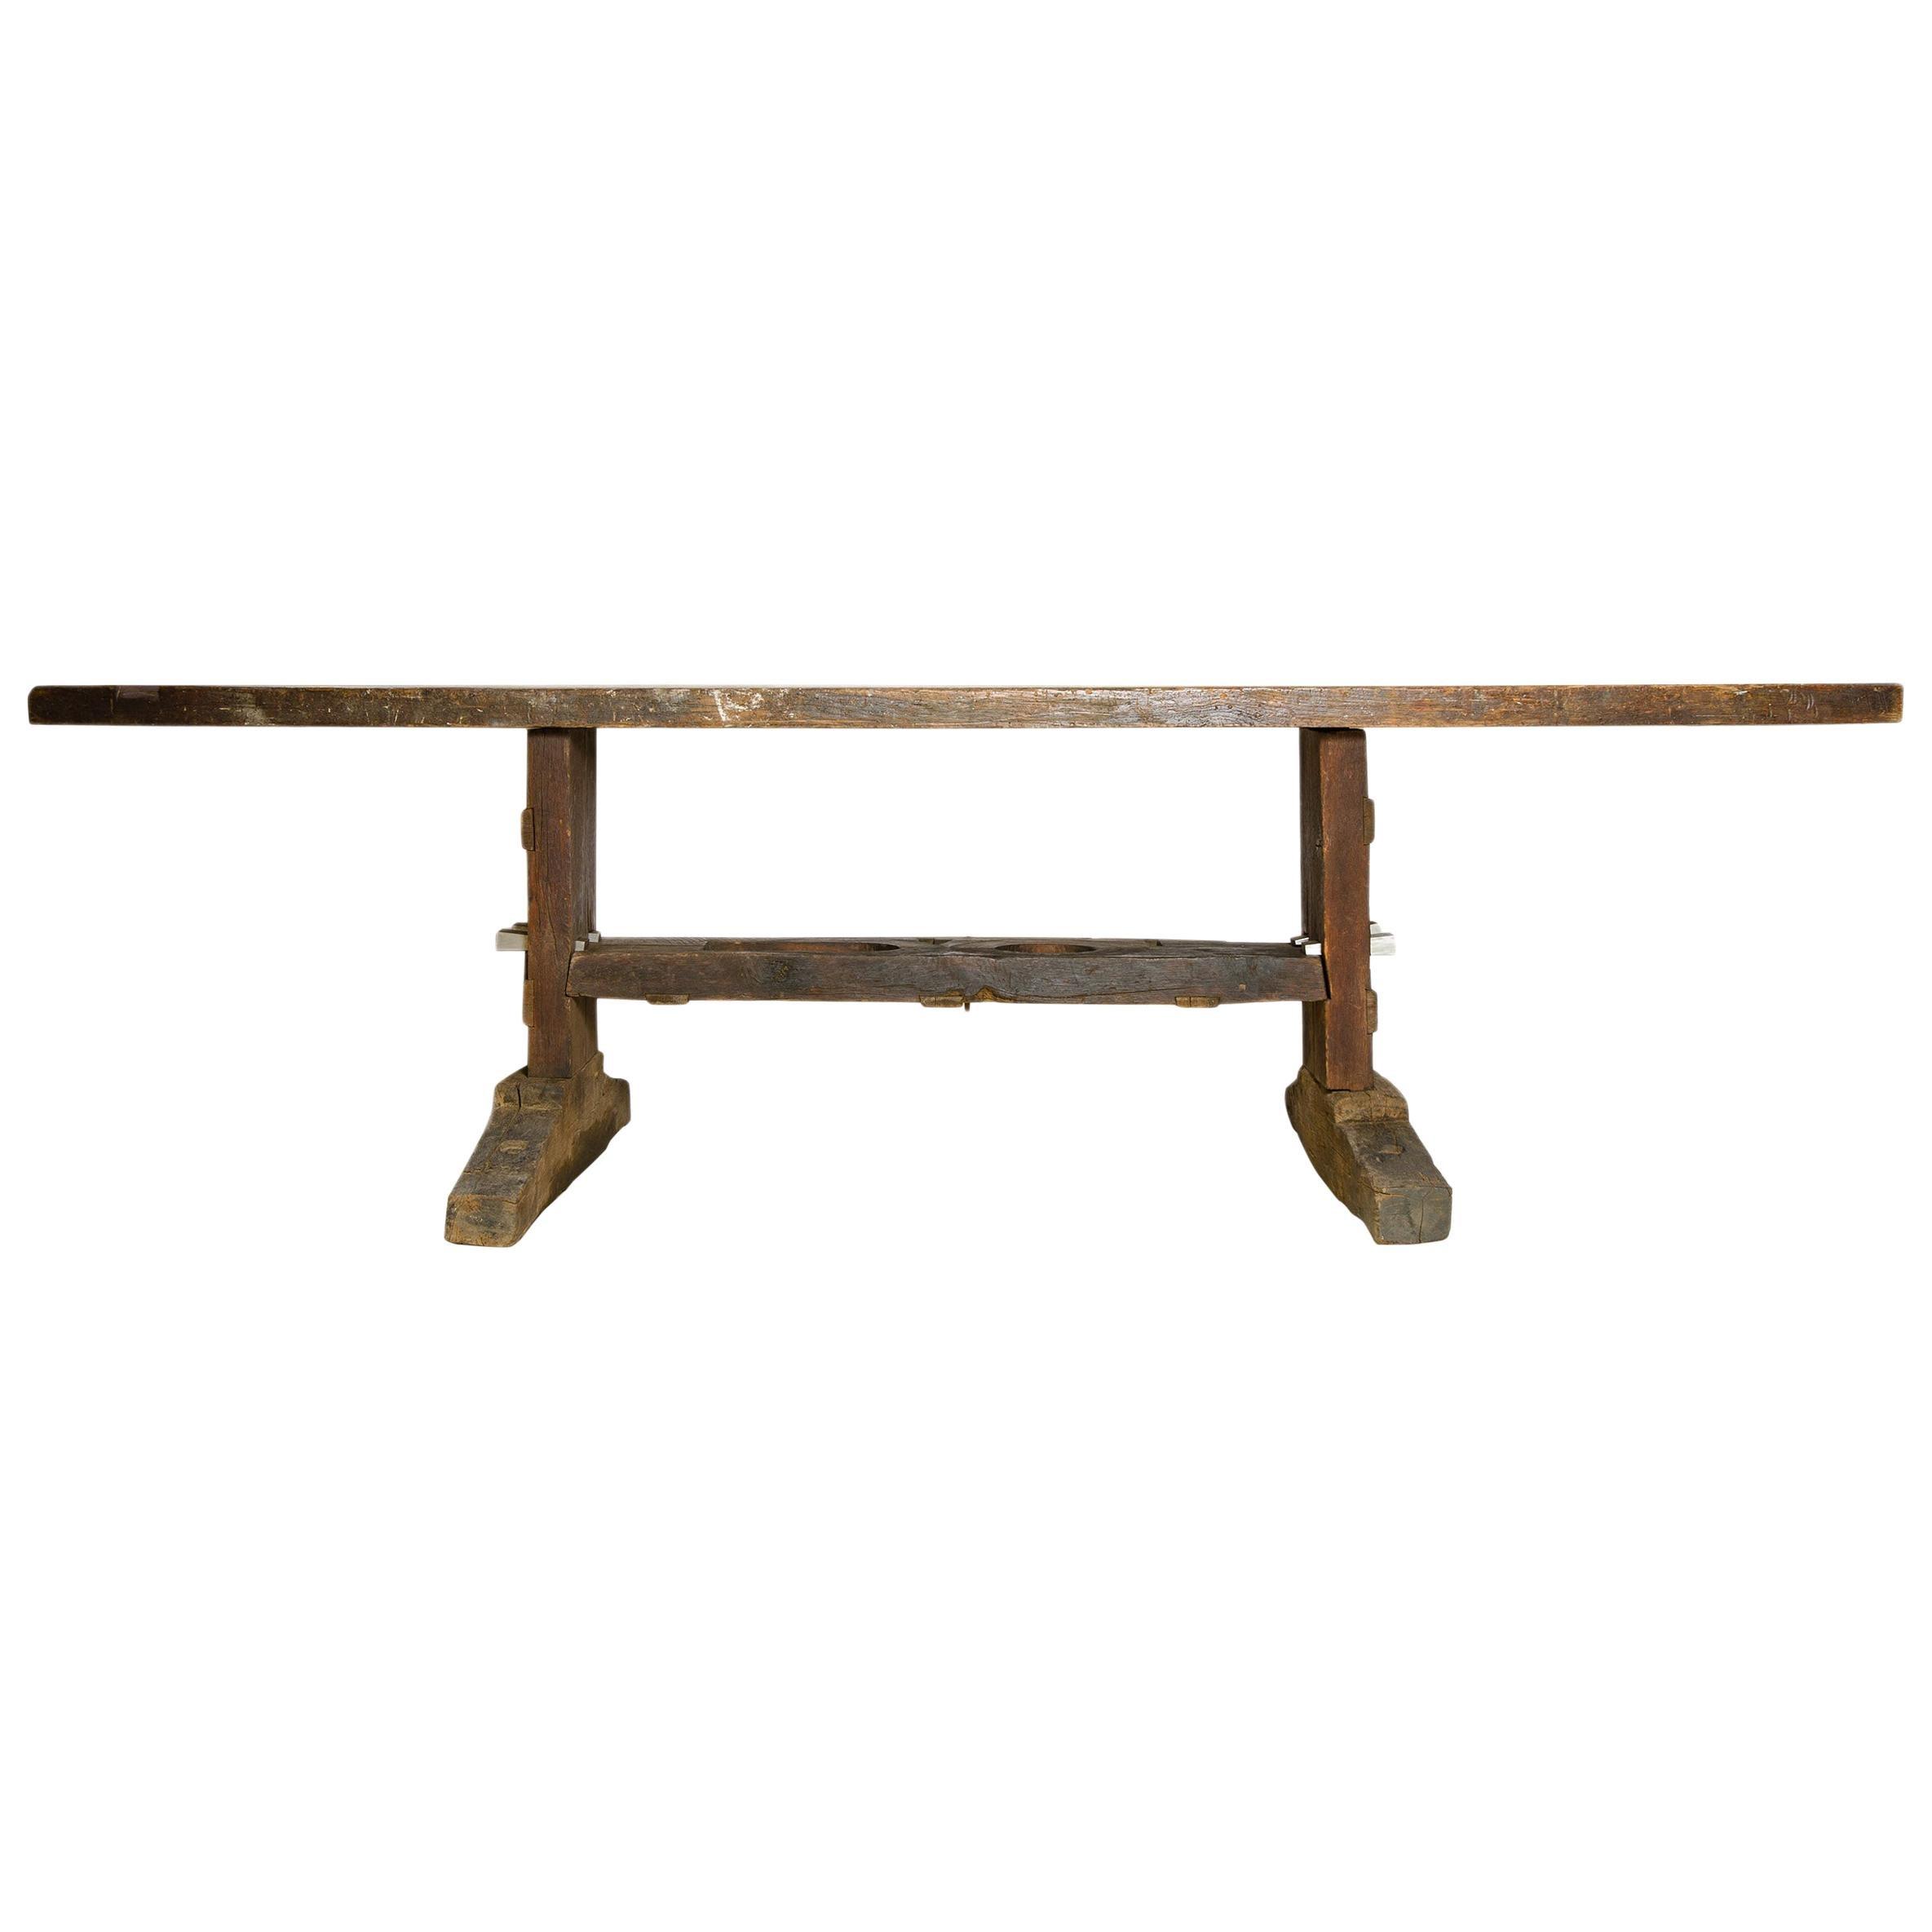 19th Century Solid Oak Work Bench